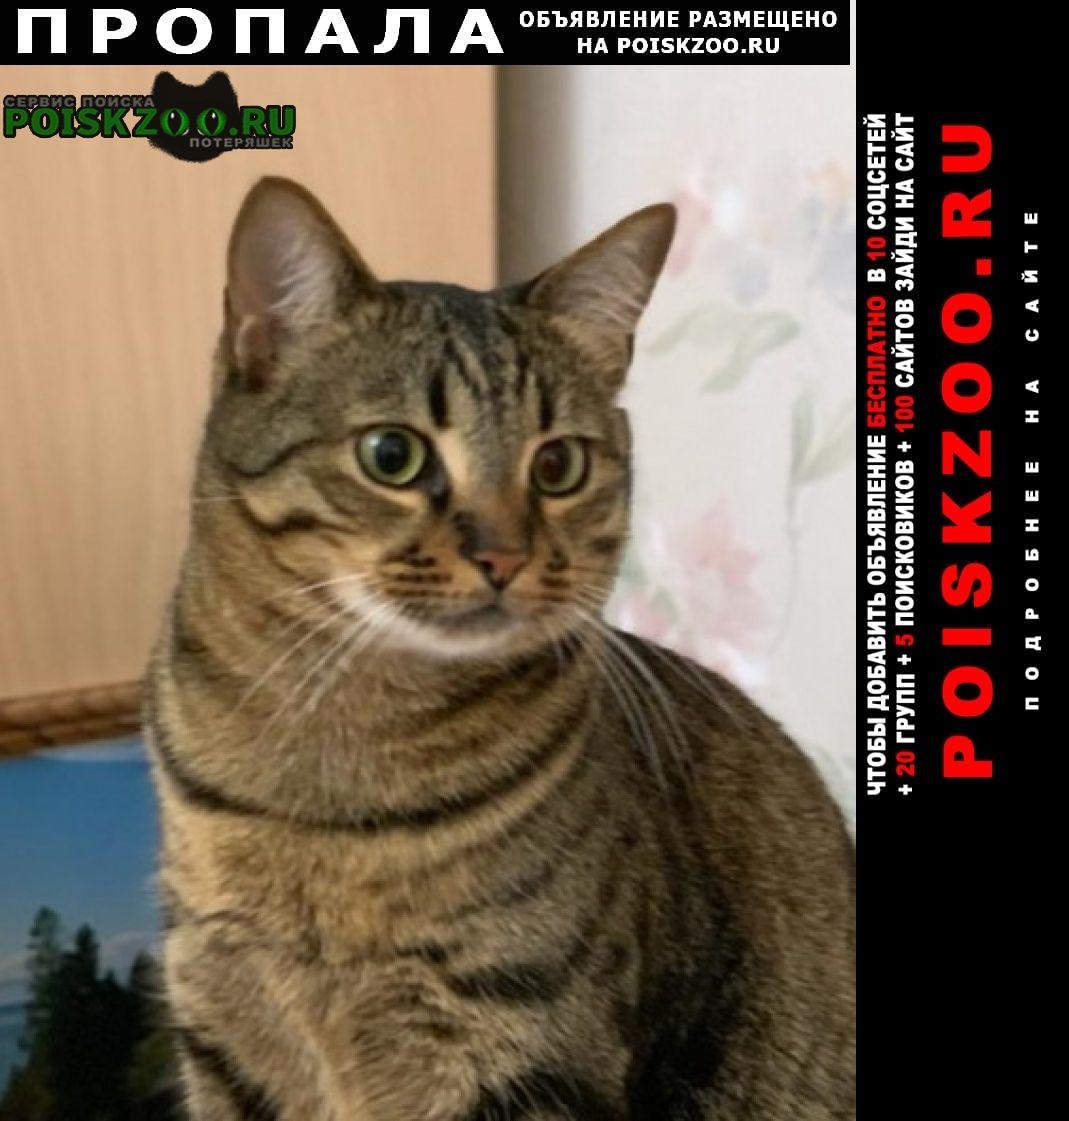 Пропал кот 3, 5 года тигрового окраса Москва